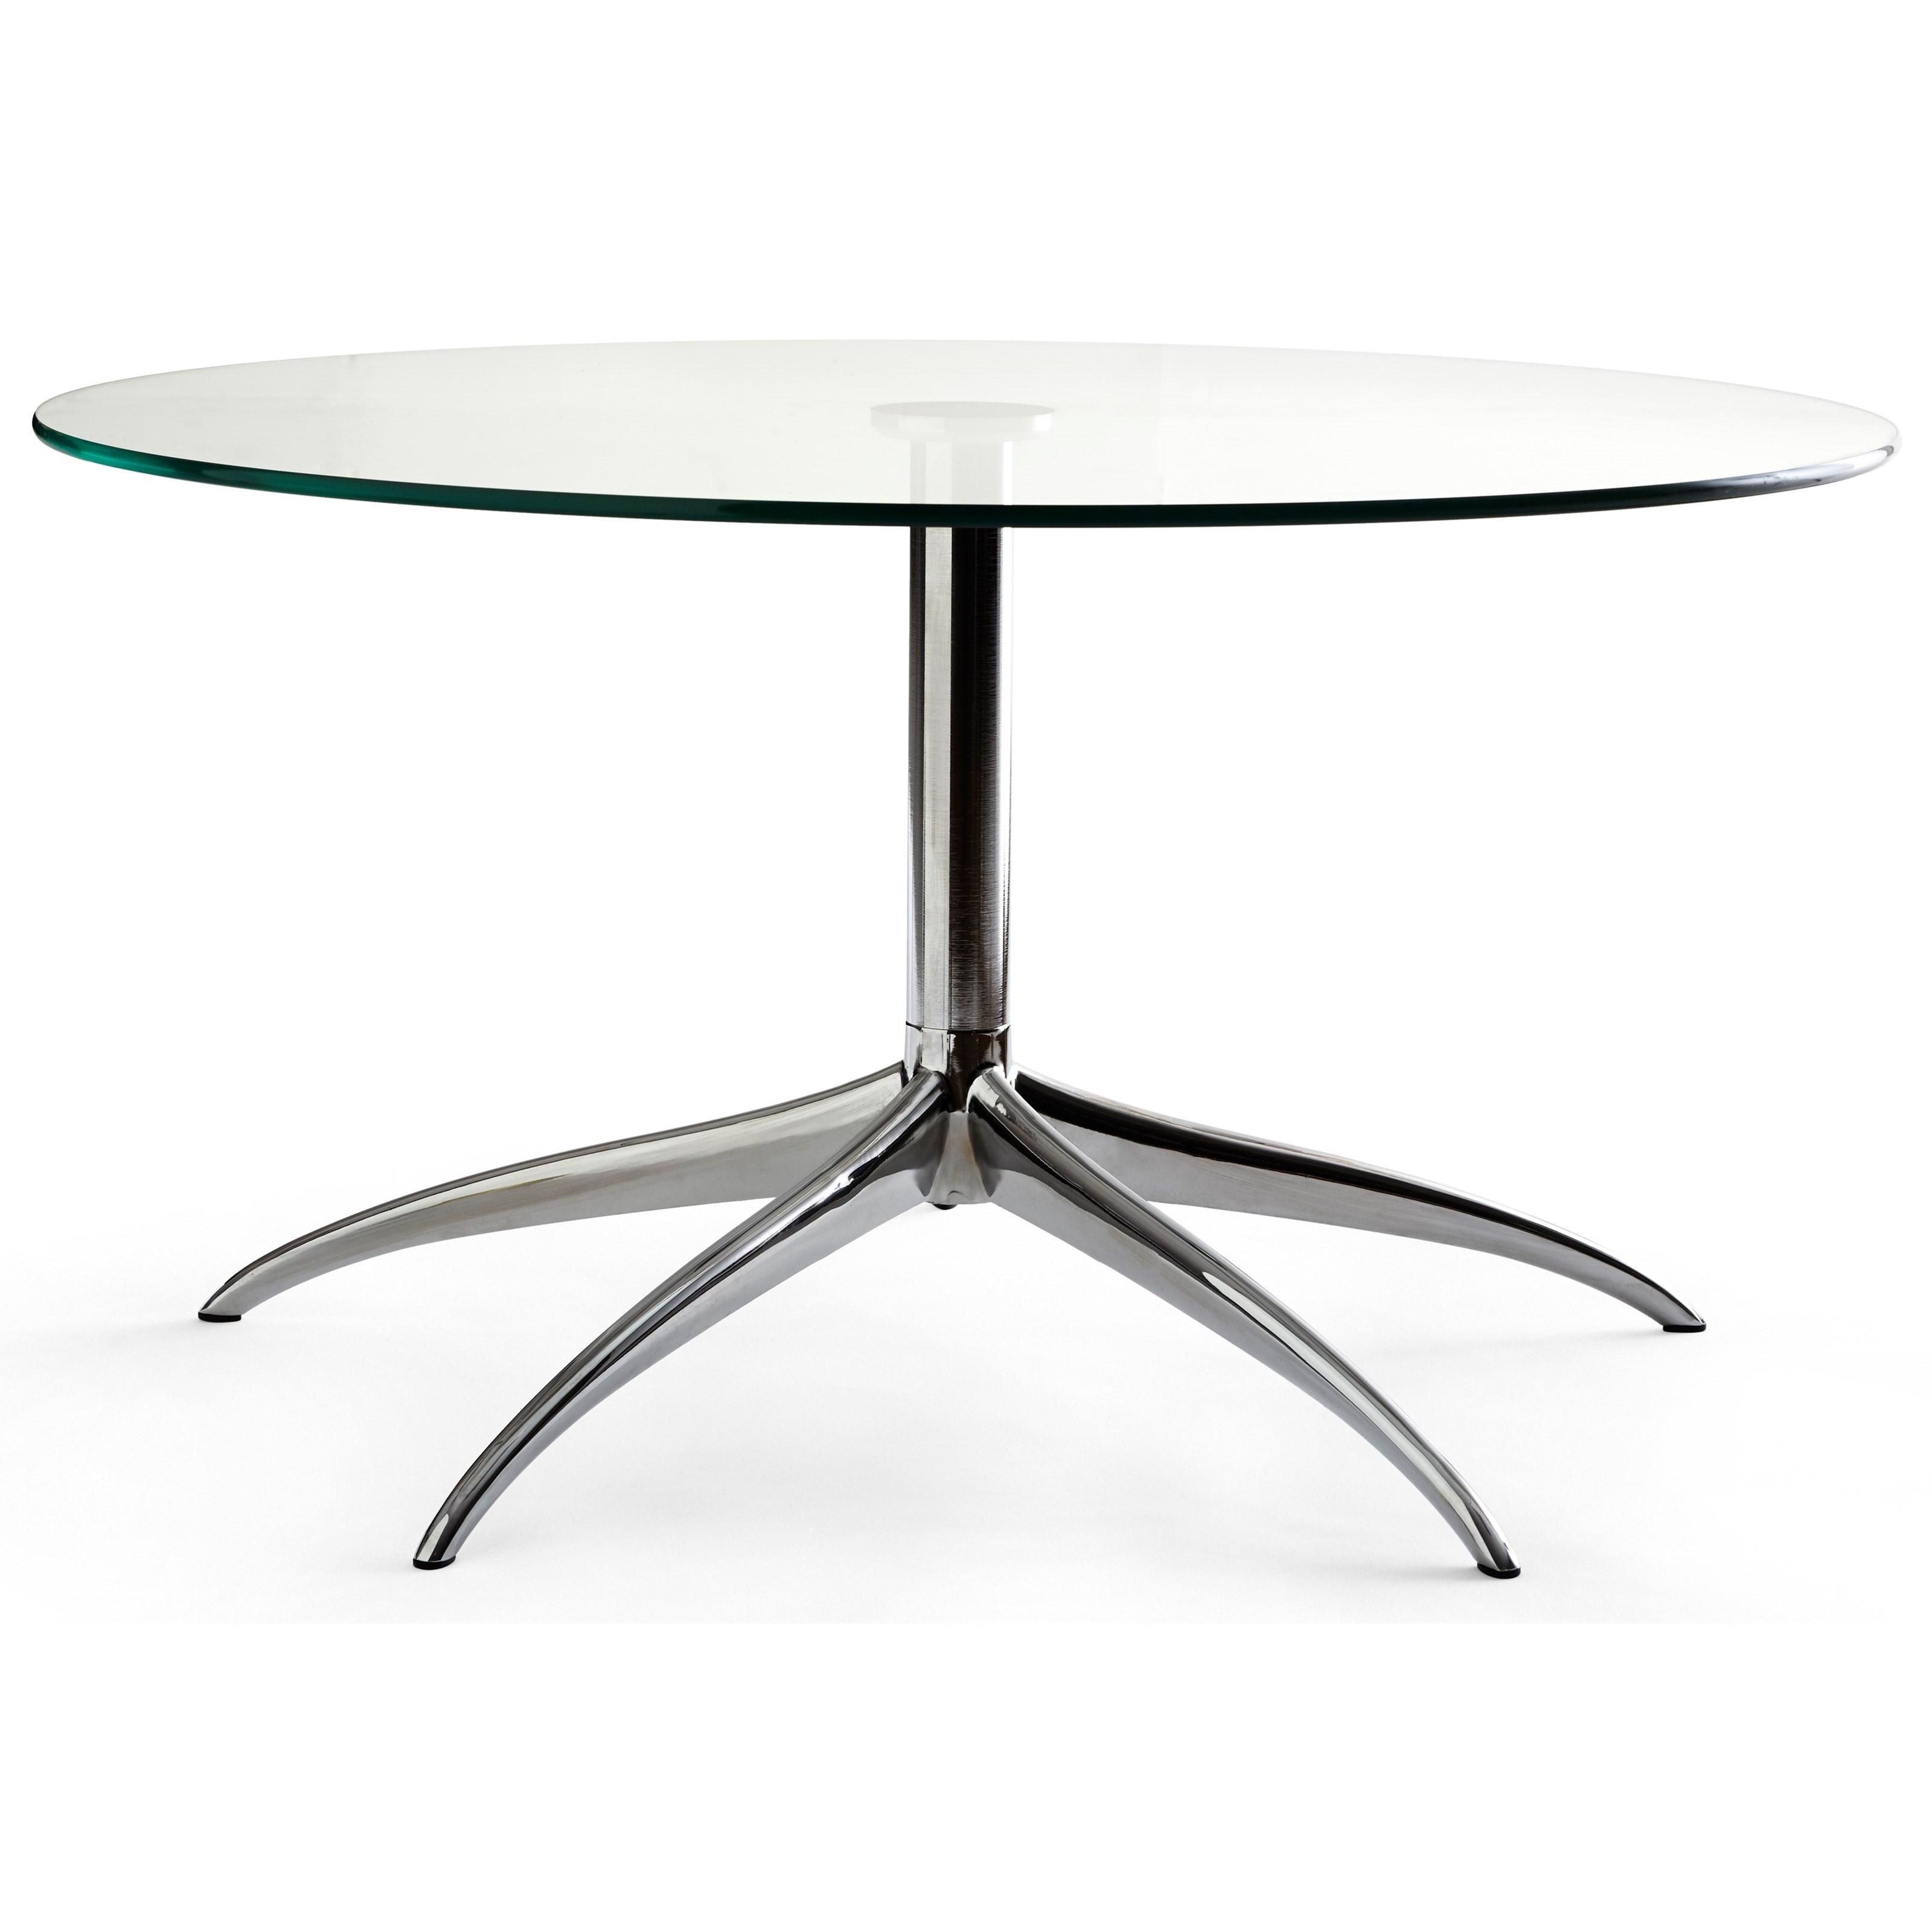 Large Urban Table